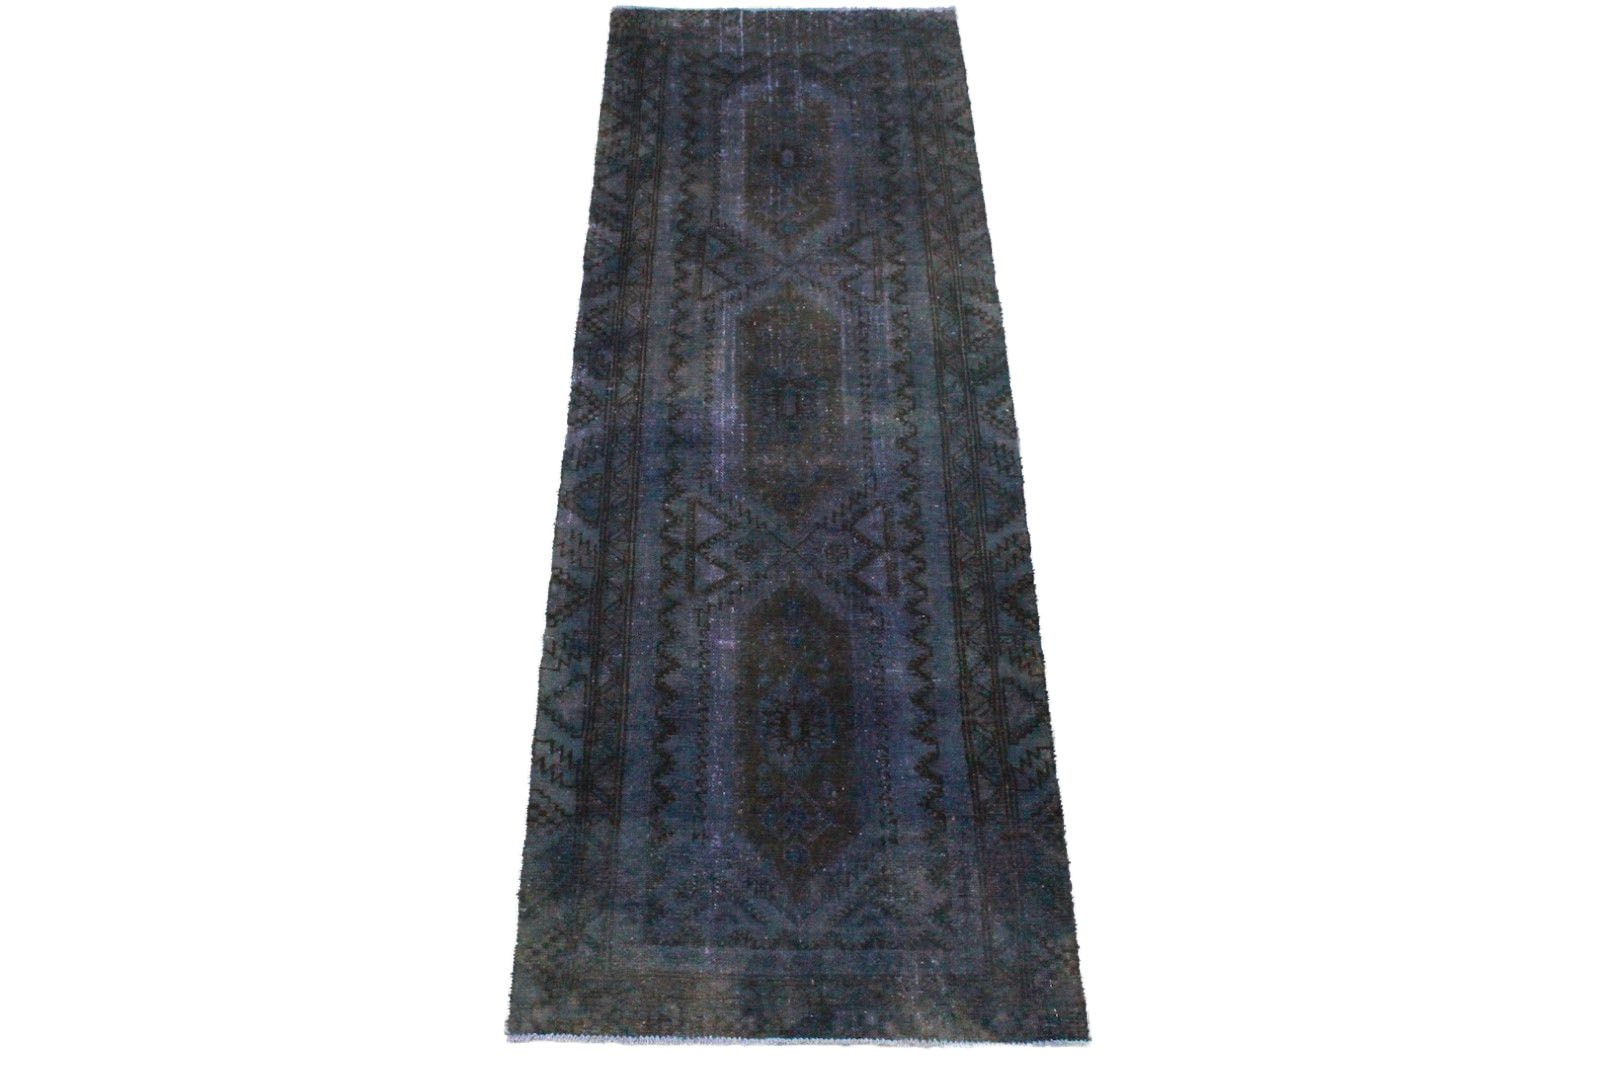 Vintage Teppich Läufer Lila In 280x90cm Vintage Teppiche Lila Teppich Teppich Design